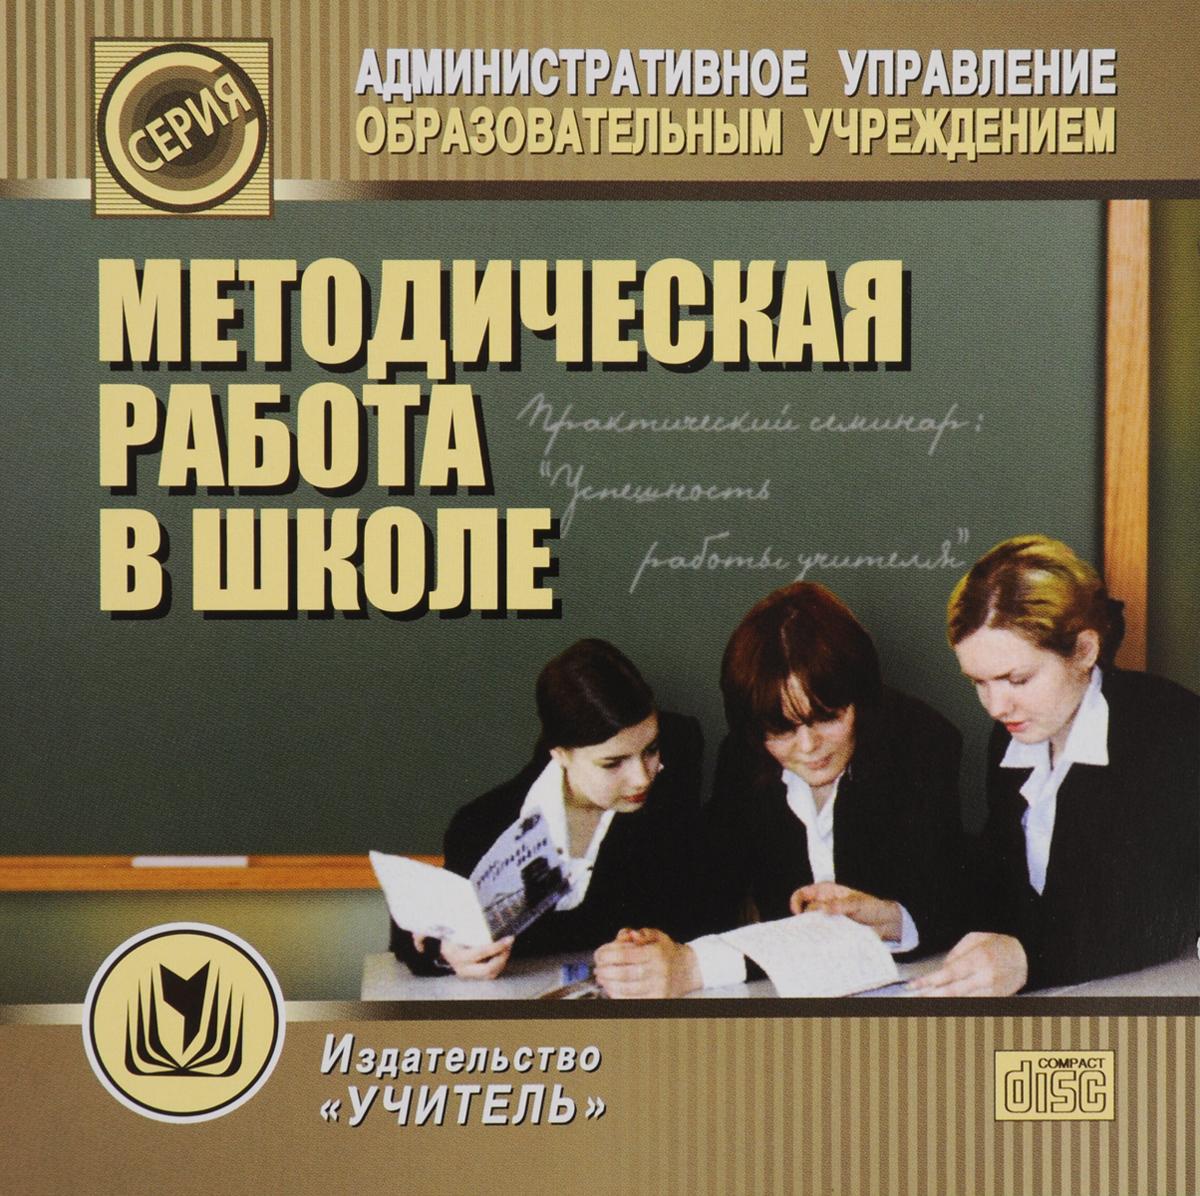 Zakazat.ru Методическая работа в школе